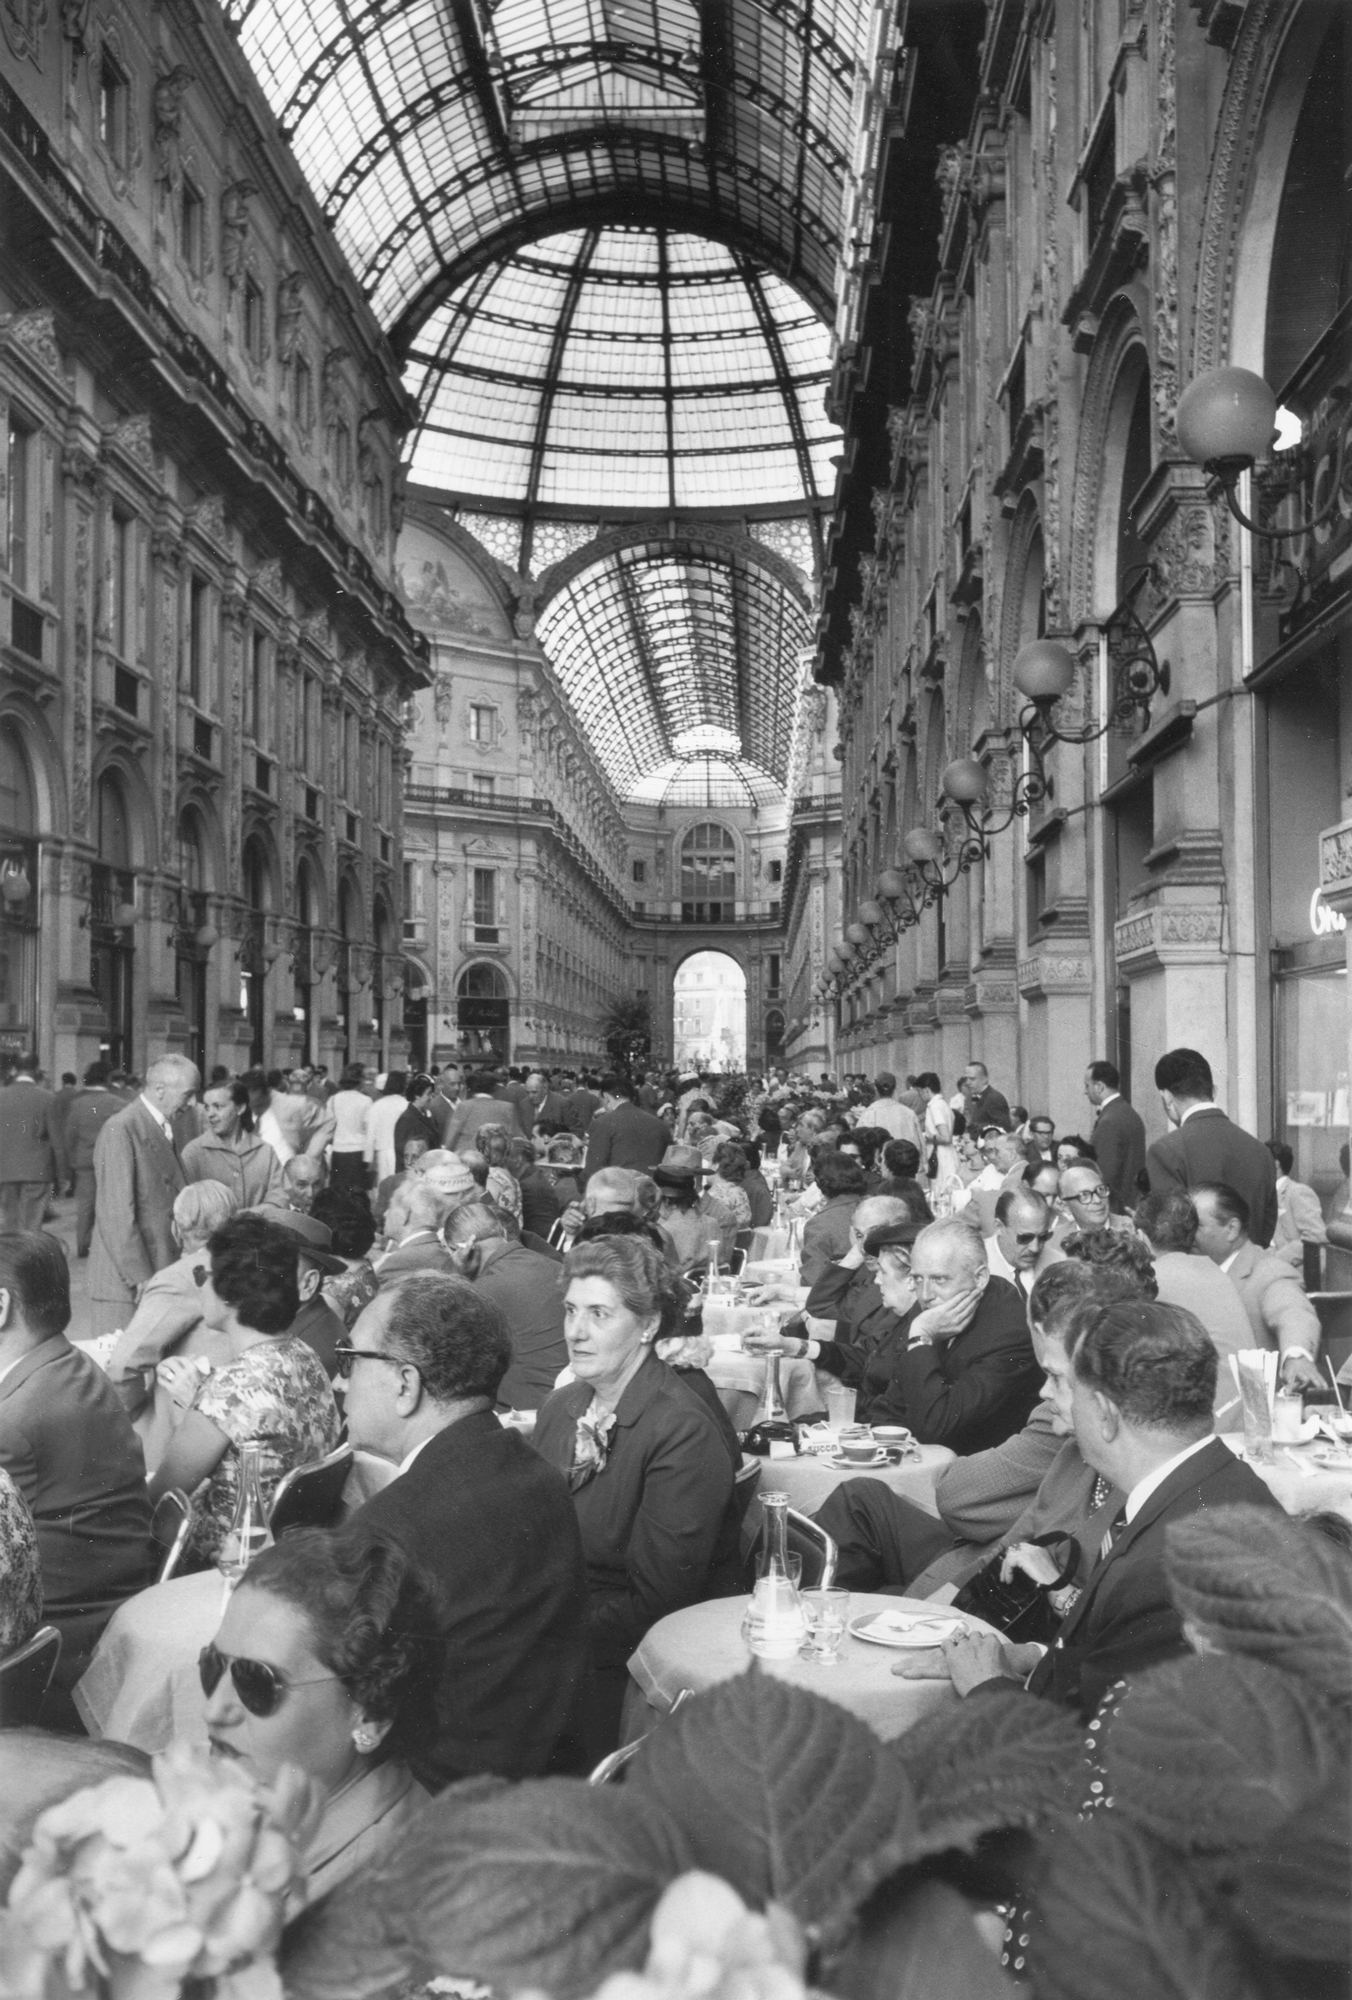 Fotó: Mario de Biasi: Galleria Vittorio Emanuele II, Milano, 1957 © Mario de Biasi/Mondadori Portfolio